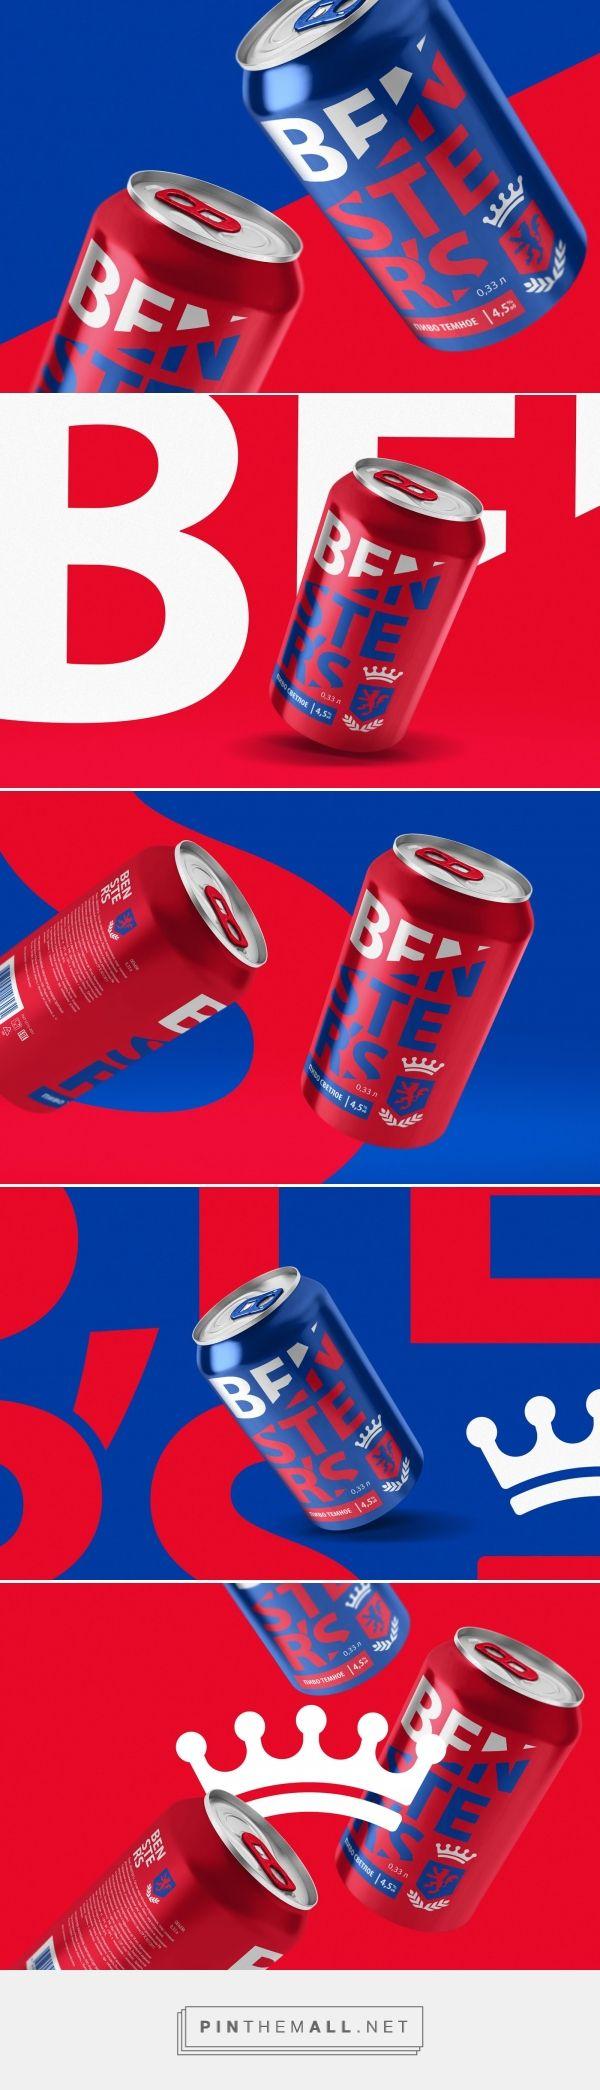 Benster's Beer - Packaging of the World - Creative Package Design Gallery - http://www.packagingoftheworld.com/2017/11/bensters-beer.html